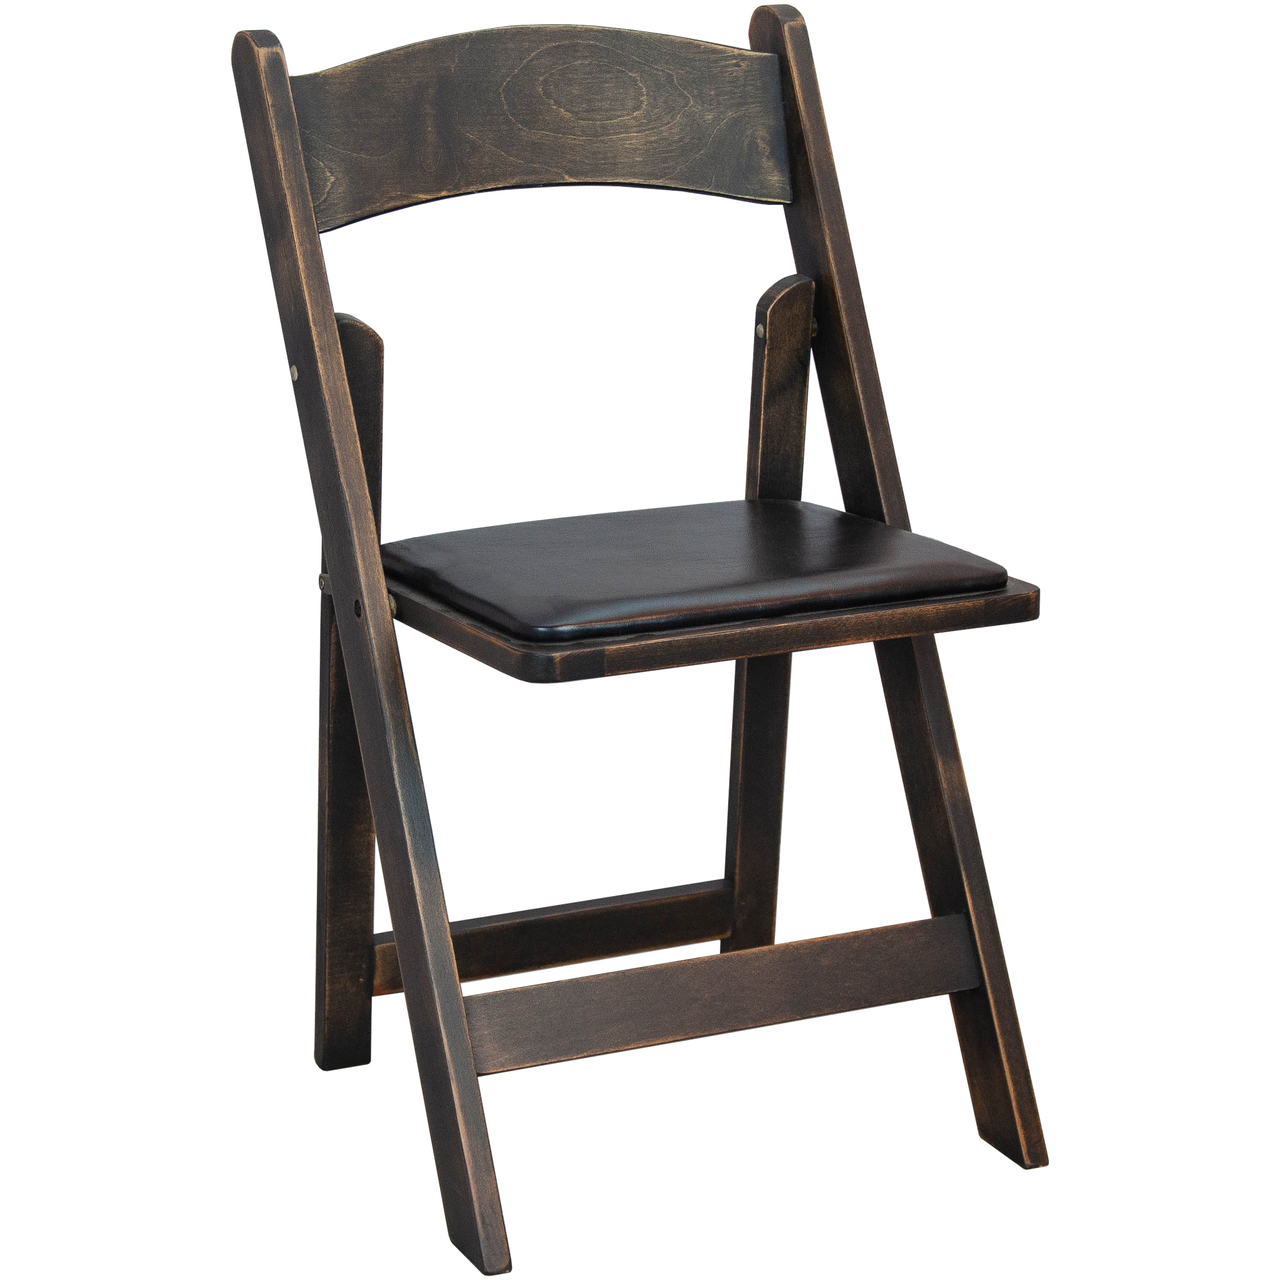 Padded Wood Folding Wedding Chair - Antique Black [WFC-AB] |  AdvantageChurchChairs.com - Padded Wood Folding Wedding Chair - Antique Black [WFC-AB